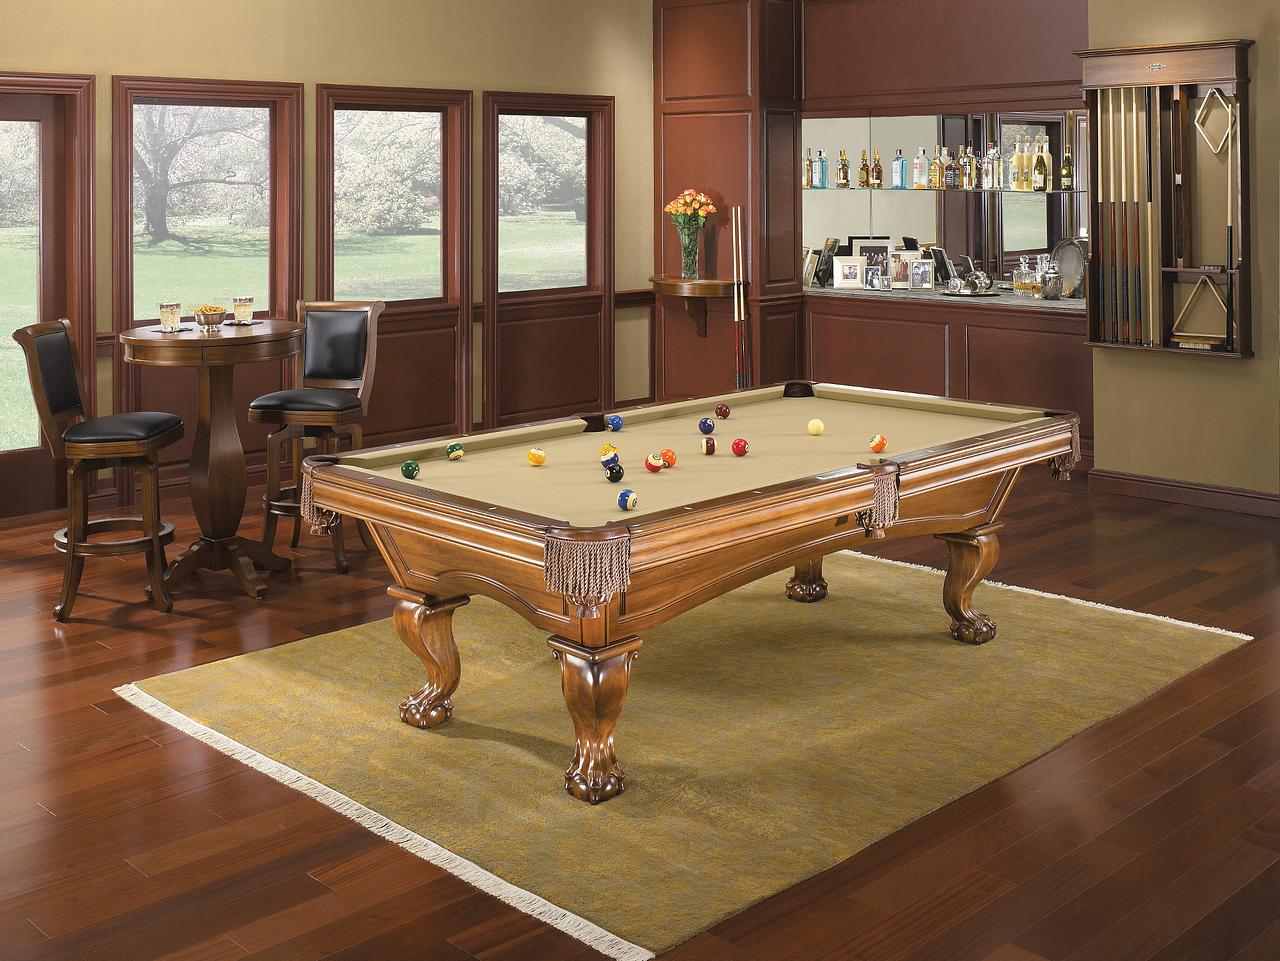 Brunswick Billiards Glenwood Pool Table - Chestnut Talon Leg in Room